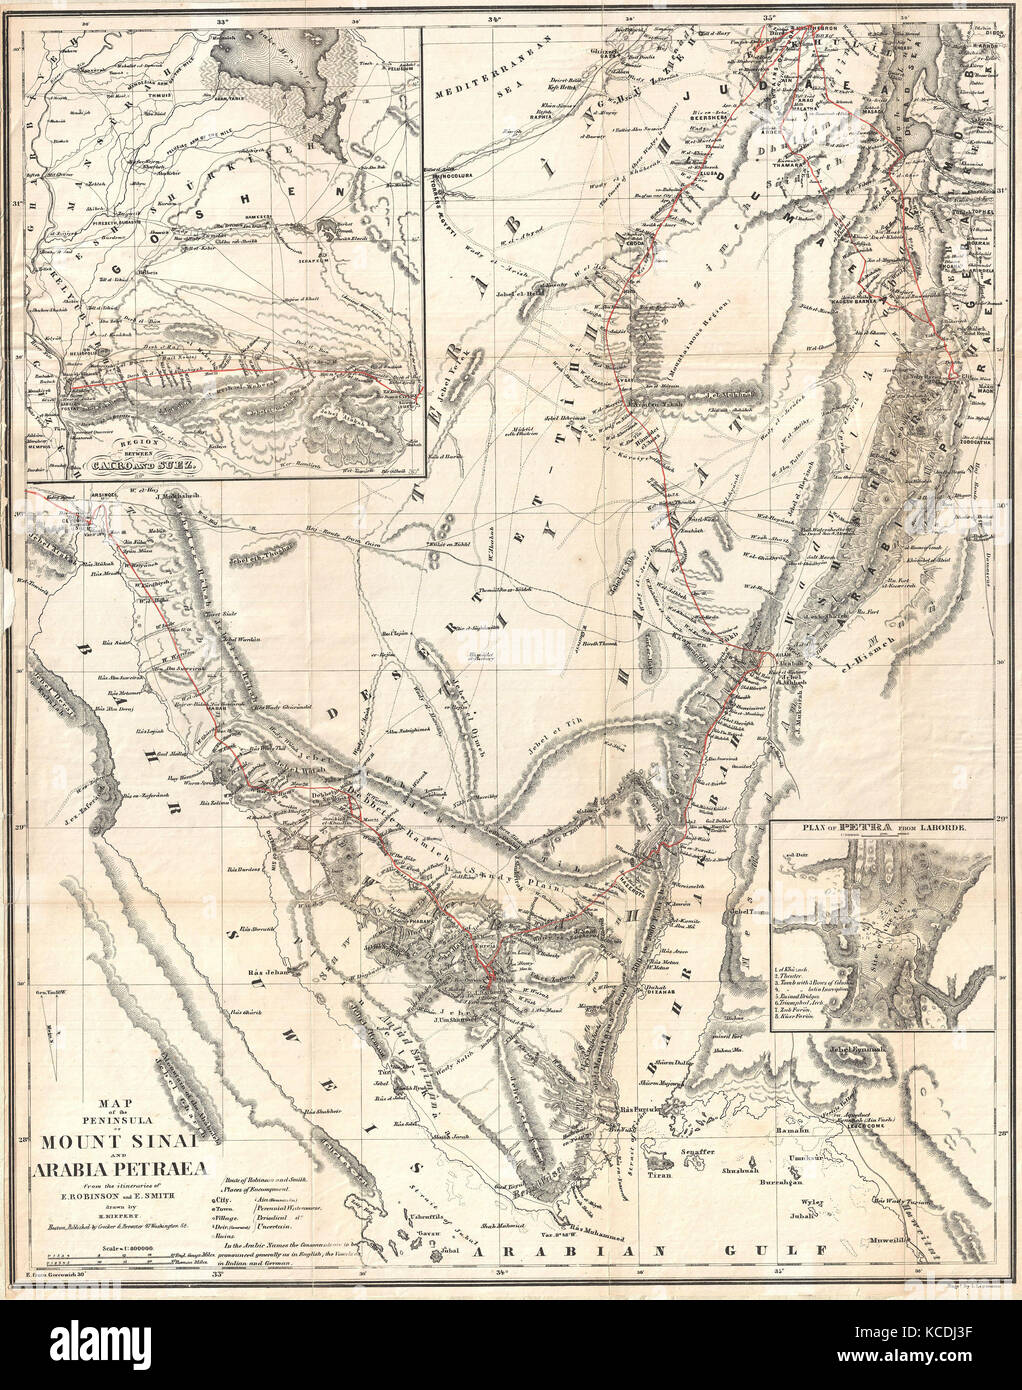 1856 Kiepert Map Of The Sinai Peninsula Egypt Stock Photo